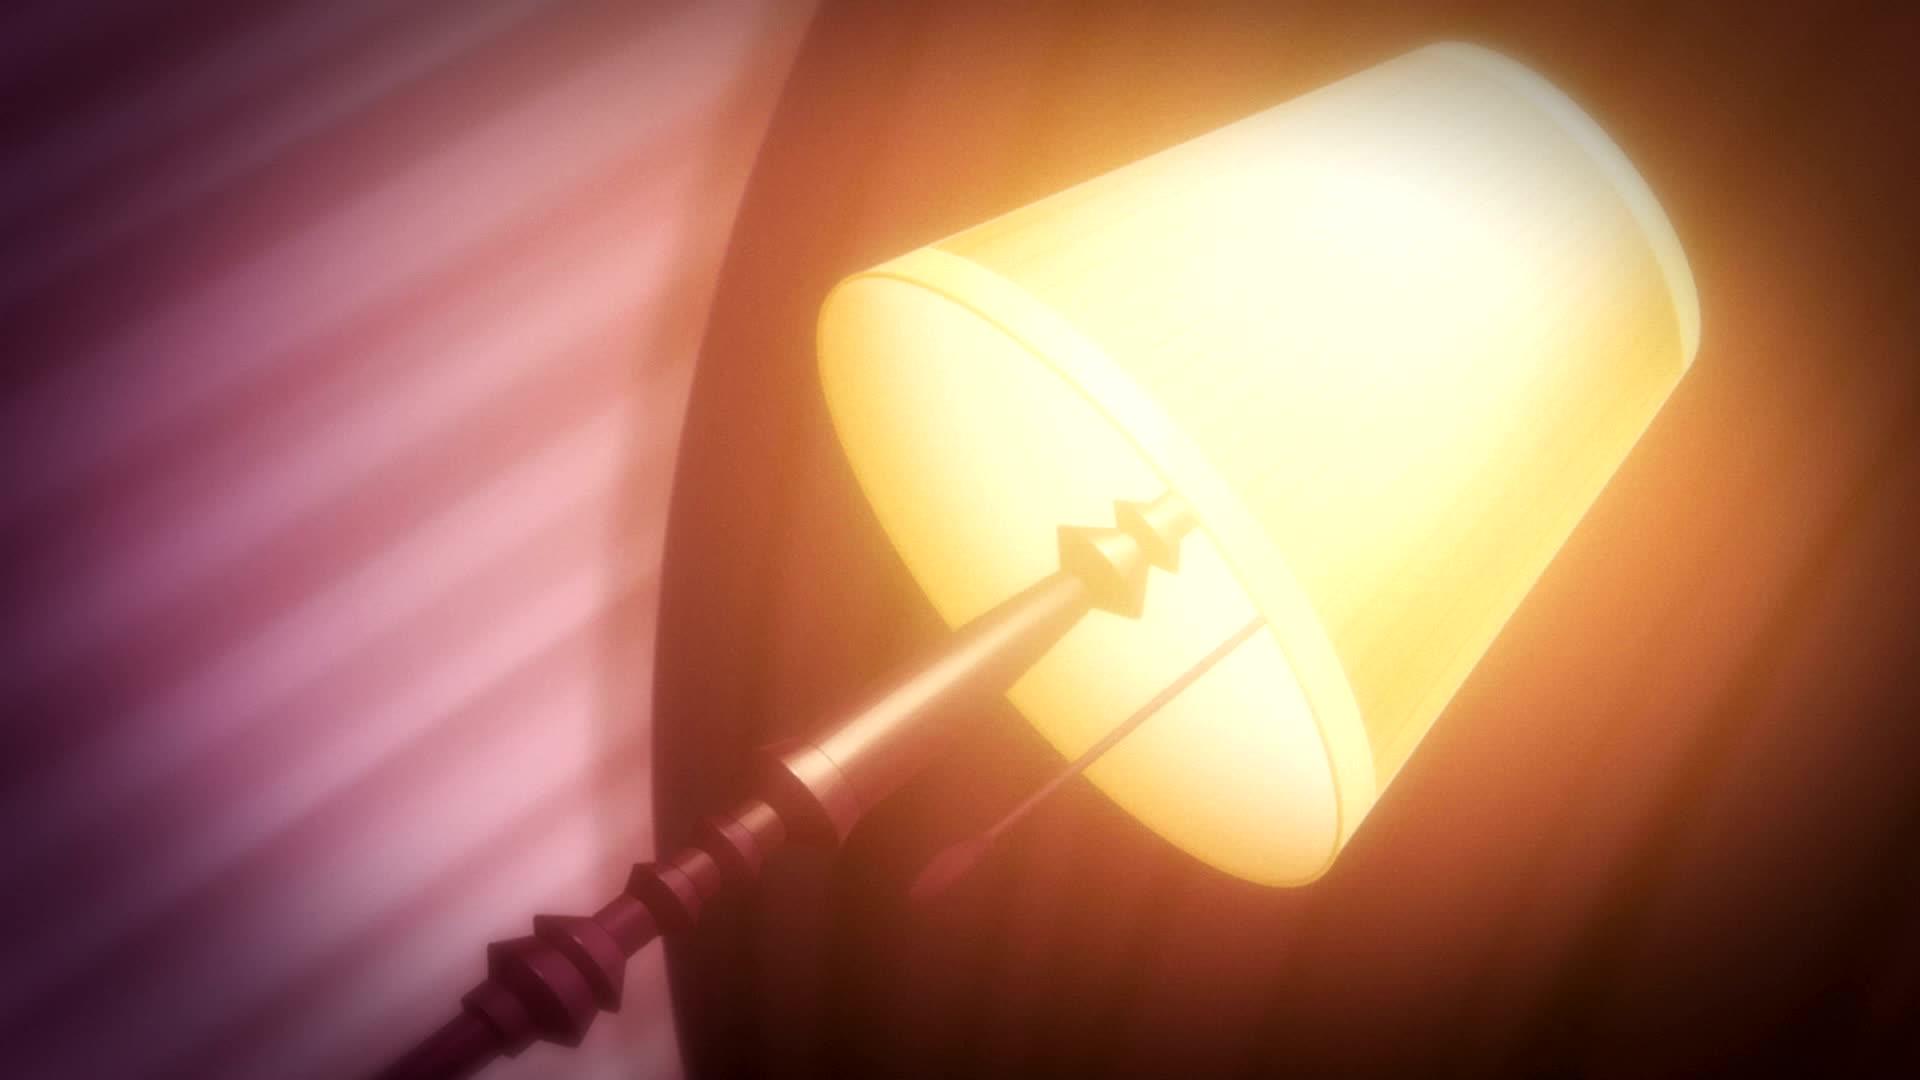 https://anime.h3dhub.com/videos/202006/09/5edeee300b079e794cb00ba6/1.jpg